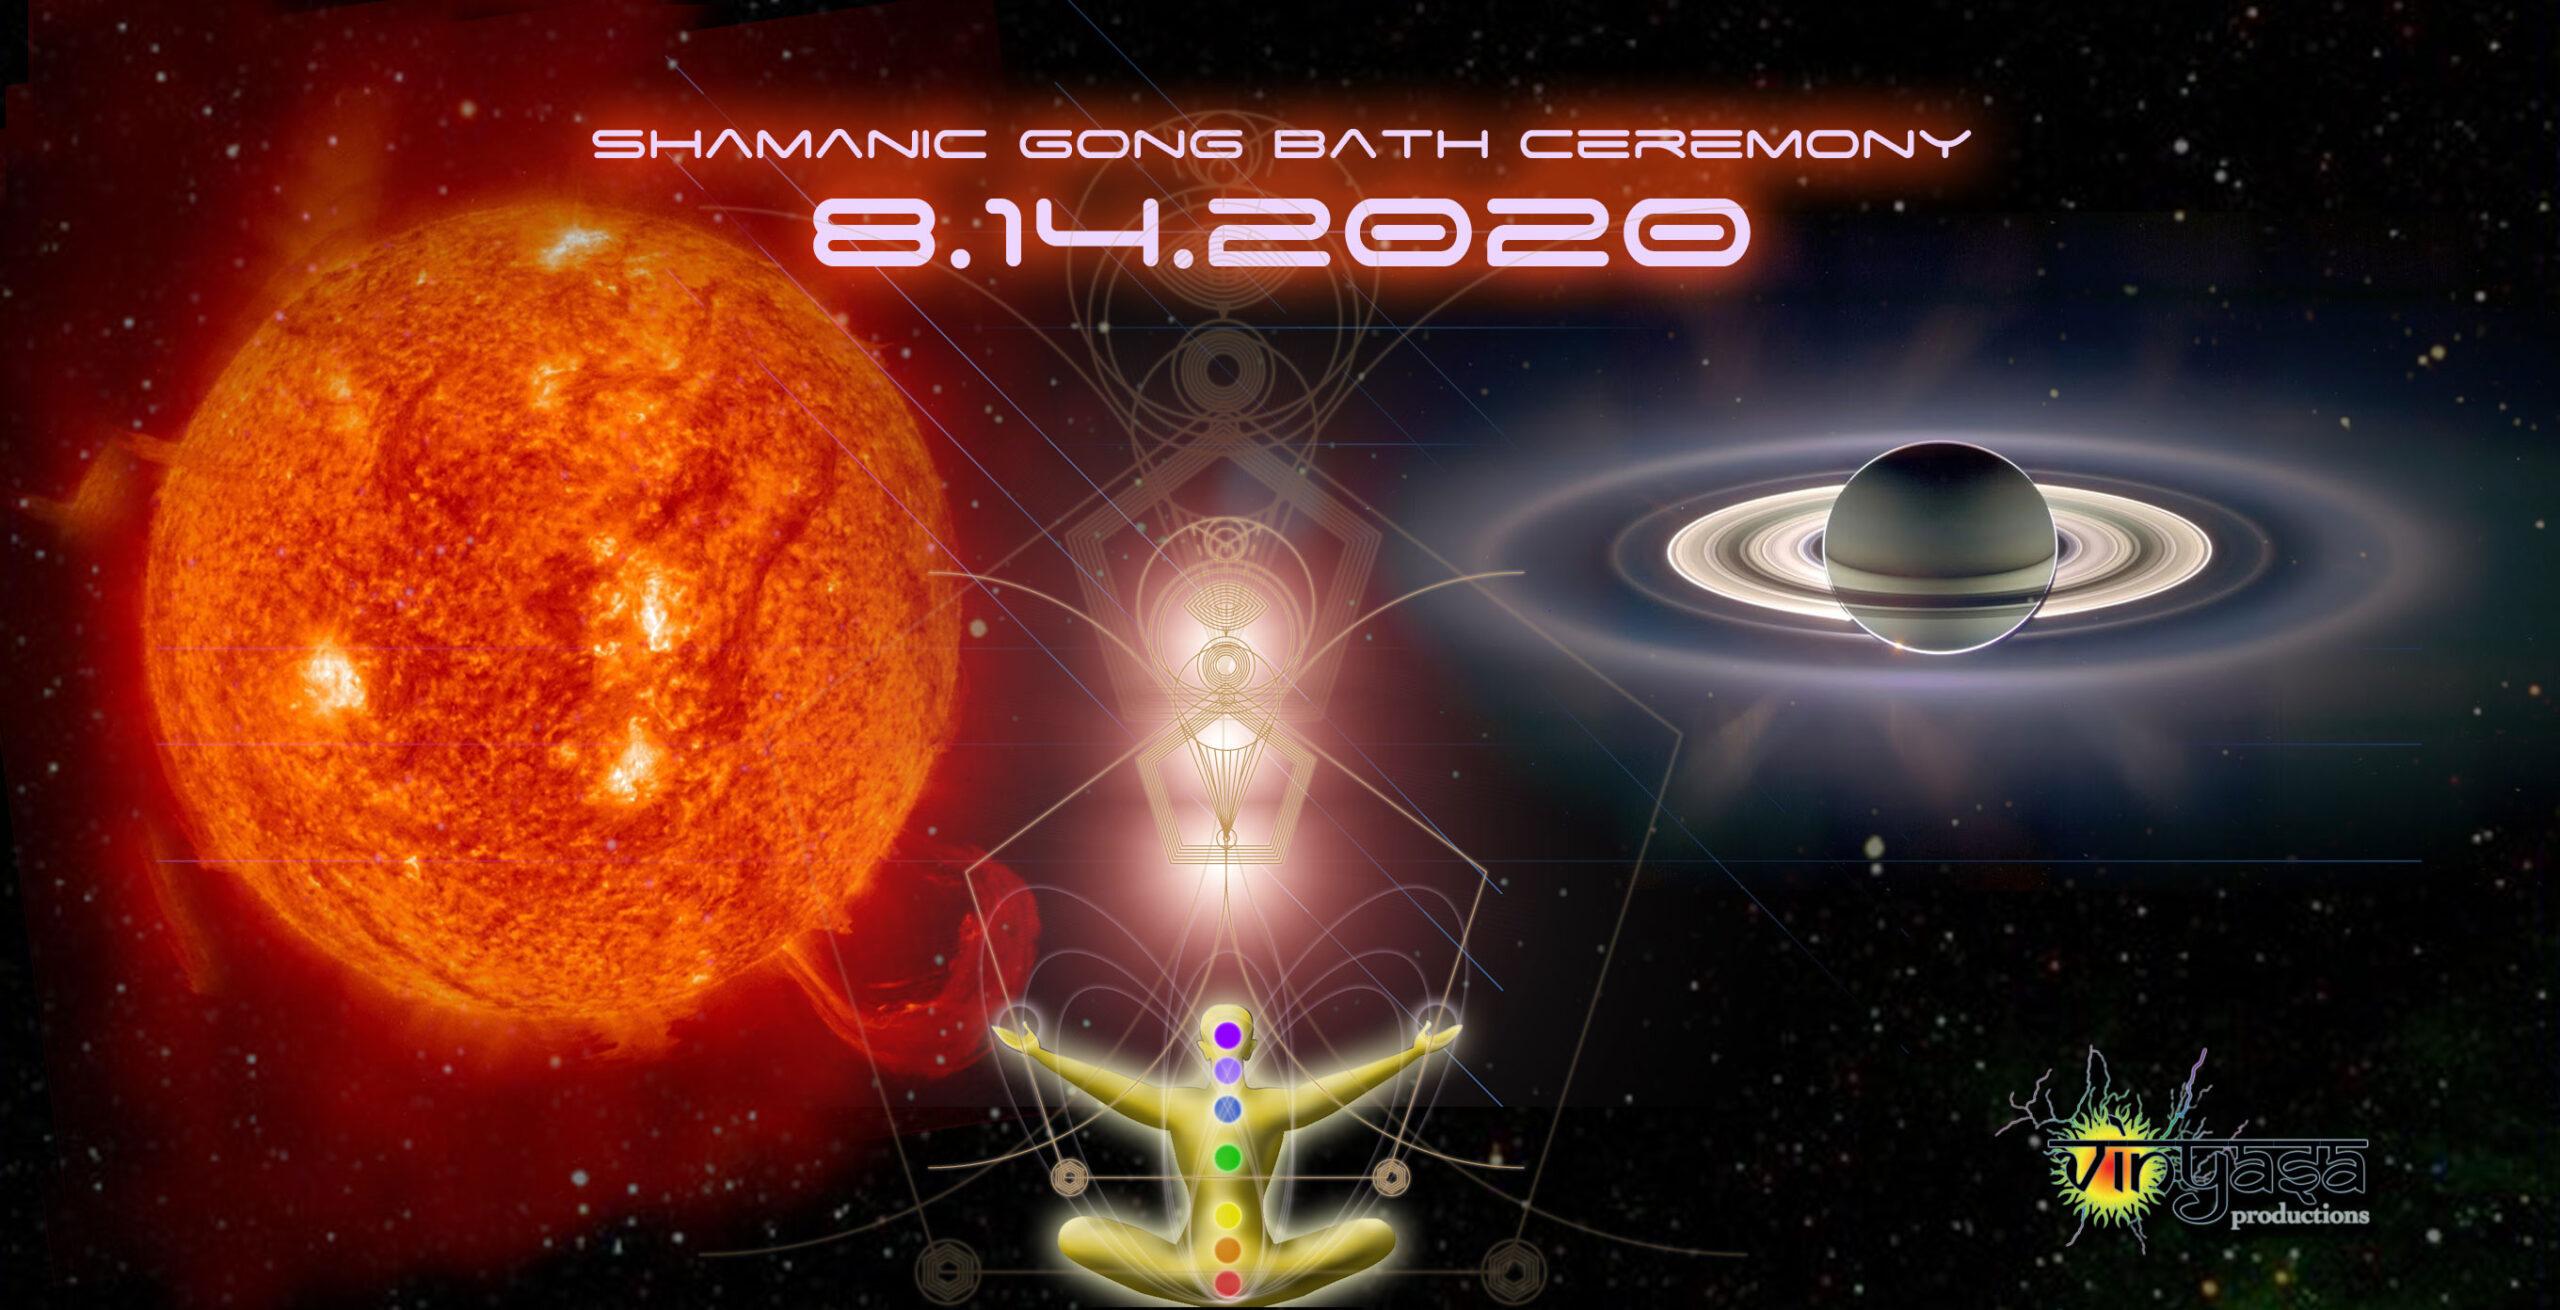 August 14, 2020 Gong Bath